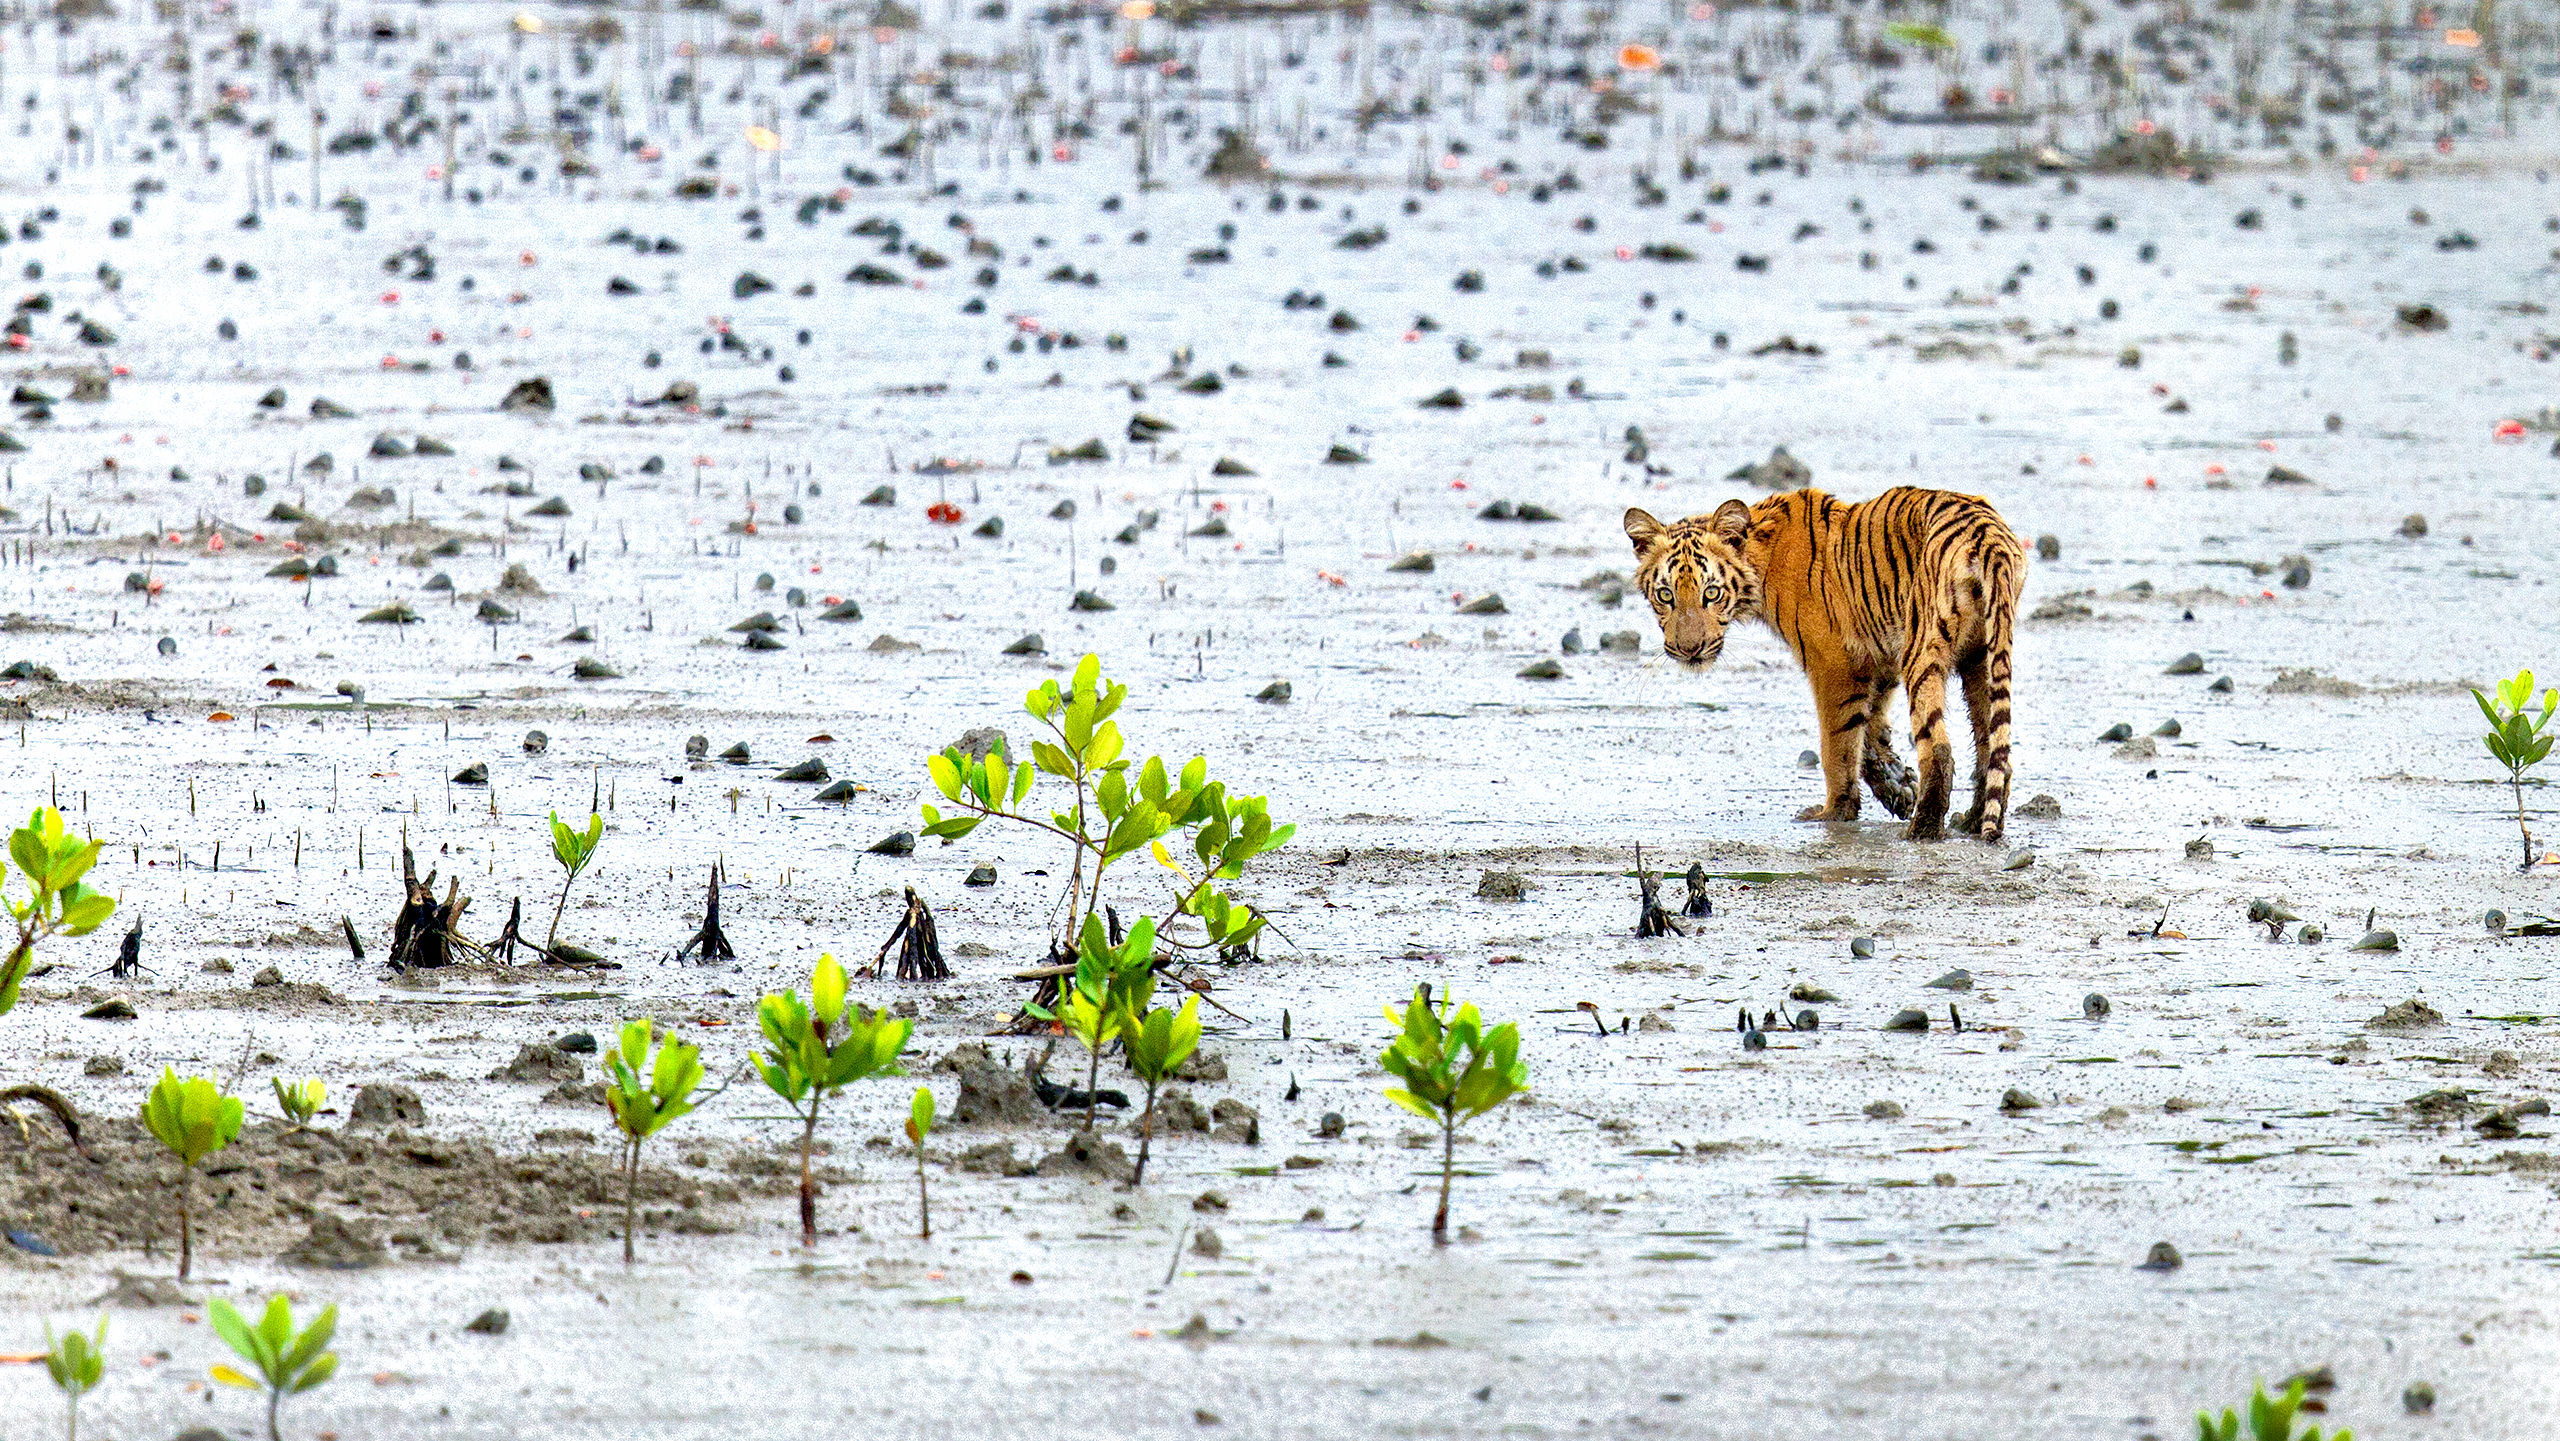 Royal Bengal Tiger in Sunderbans by Arindam Bhattacharya